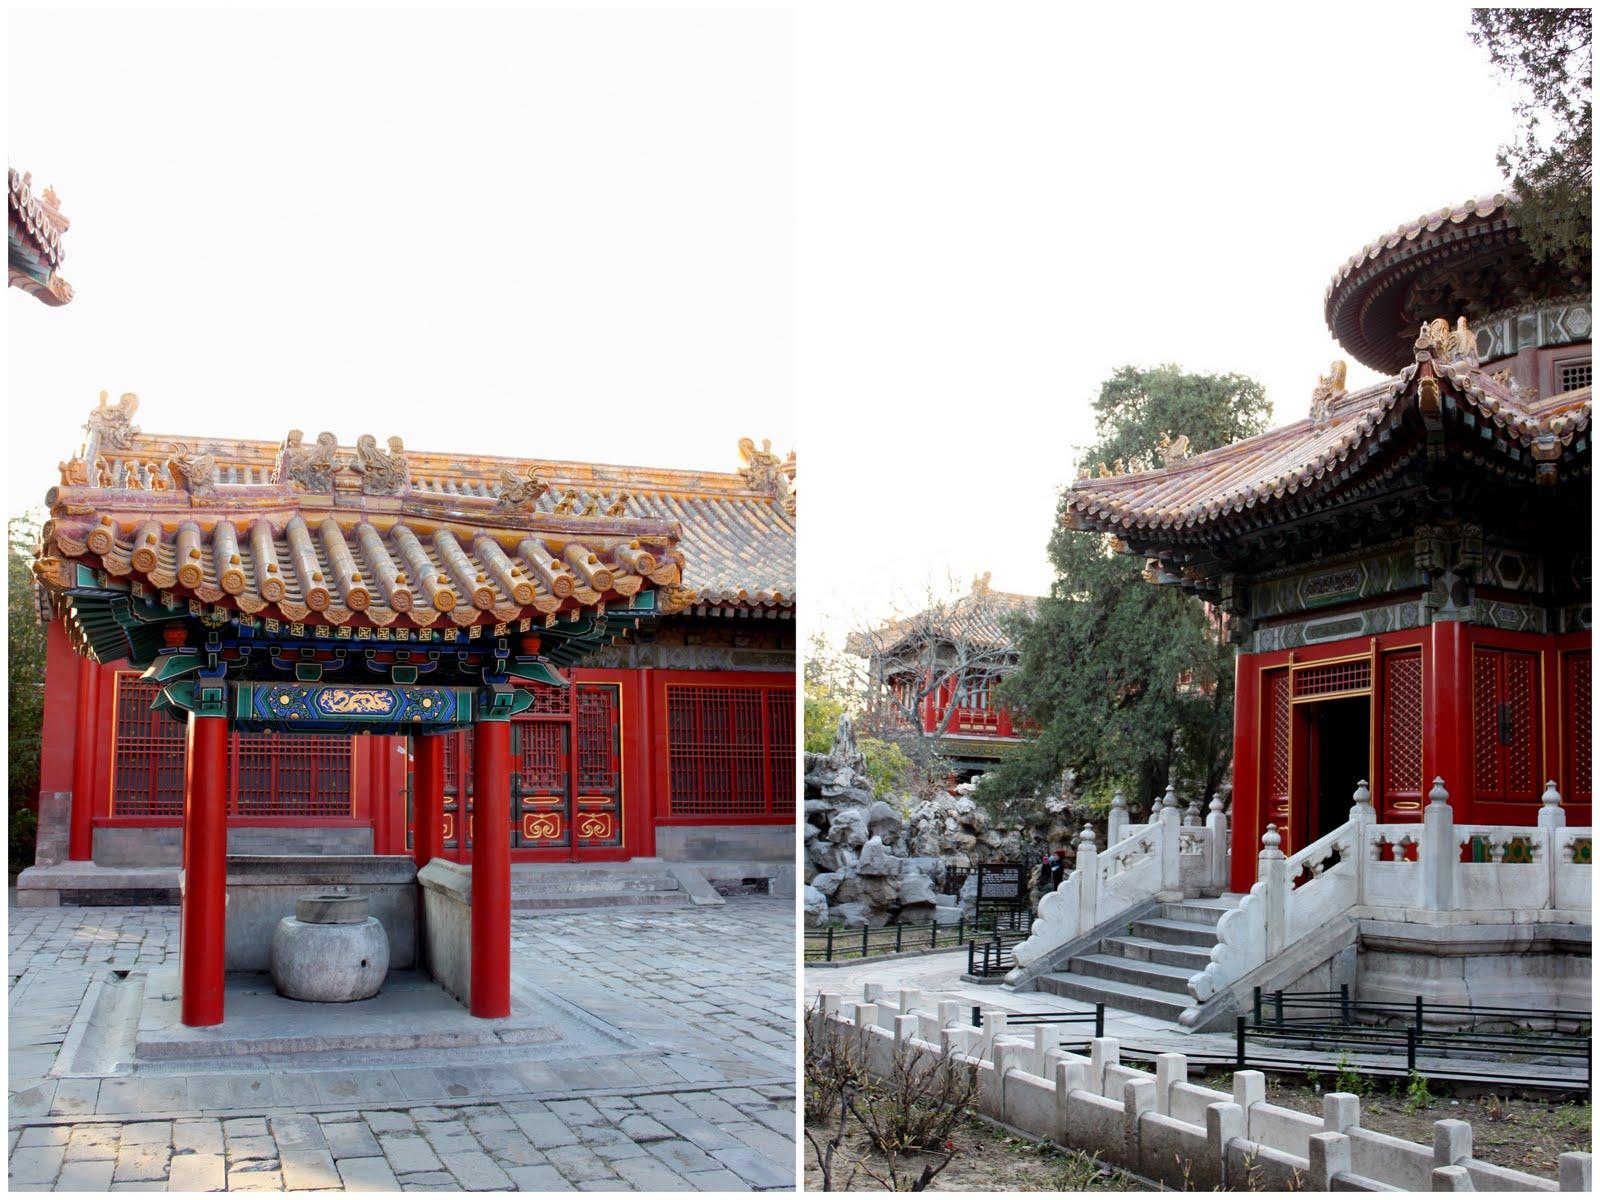 *the simplest aphrodisiac: Beijing. China: Forbidden City